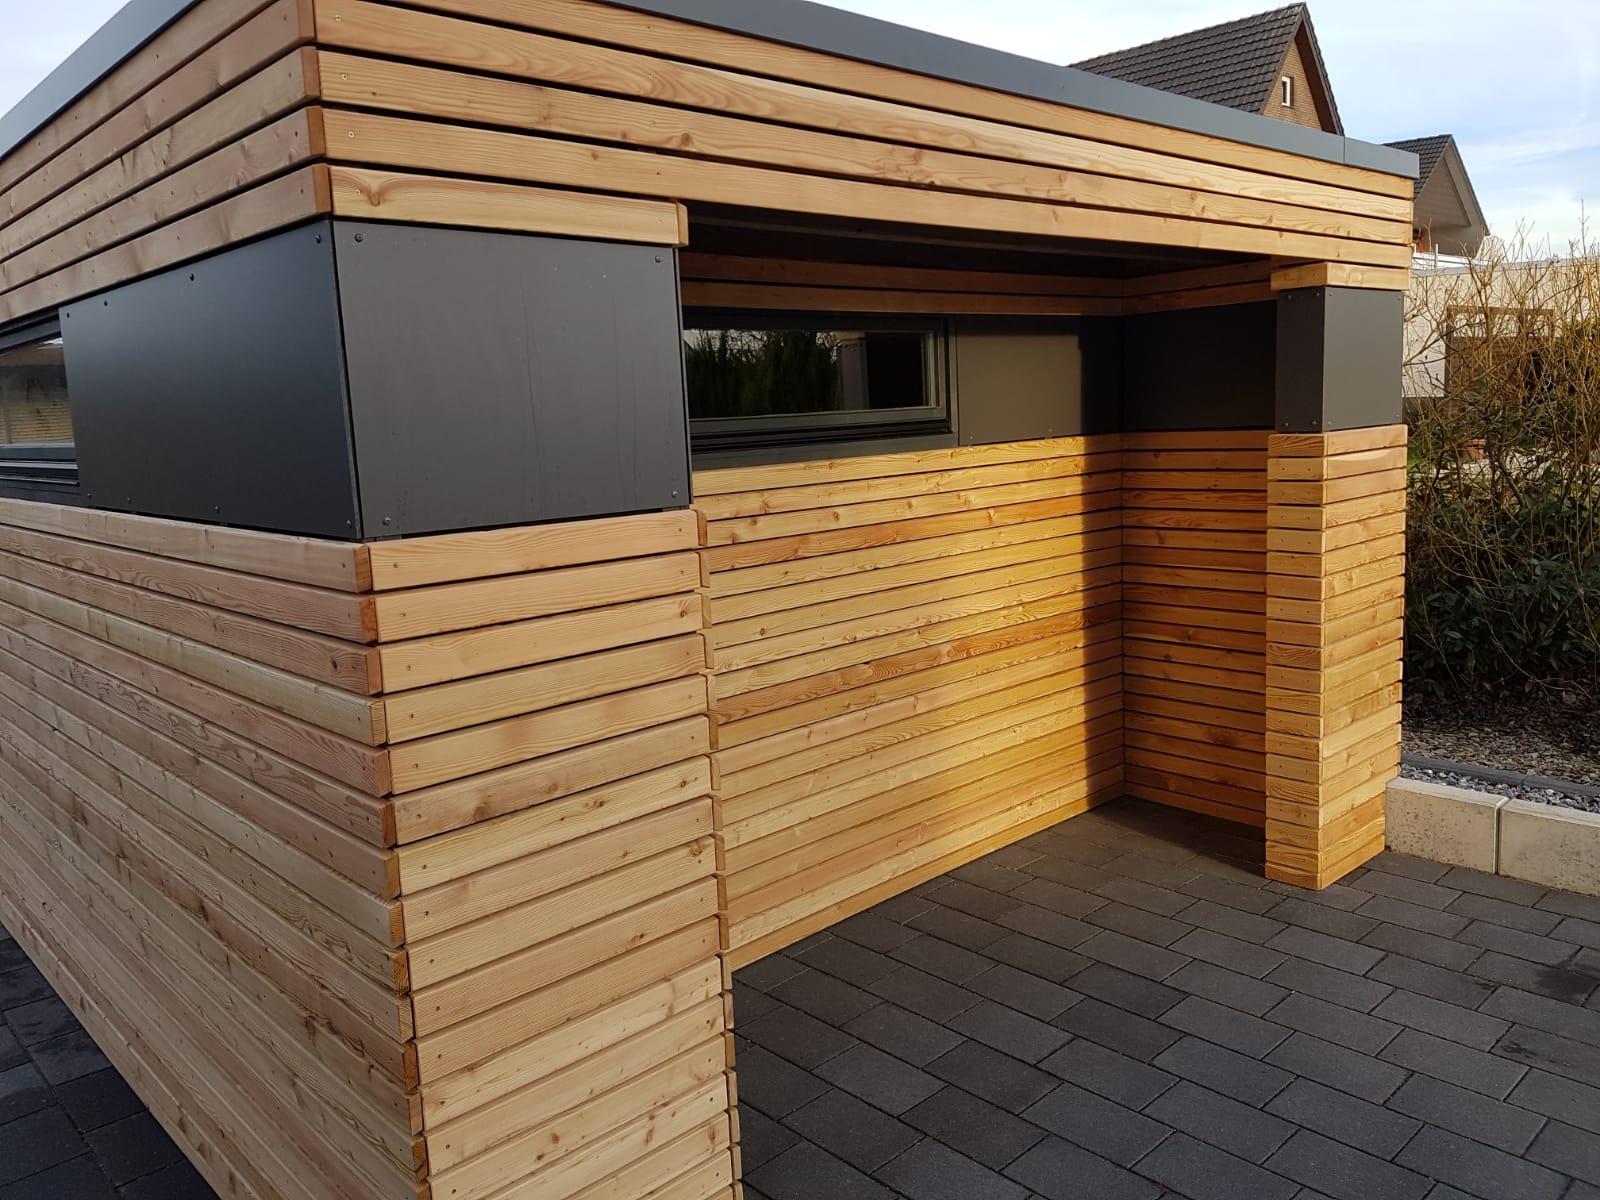 Gartenhaus, Blockcube, Detail, Holz + Aluelemente